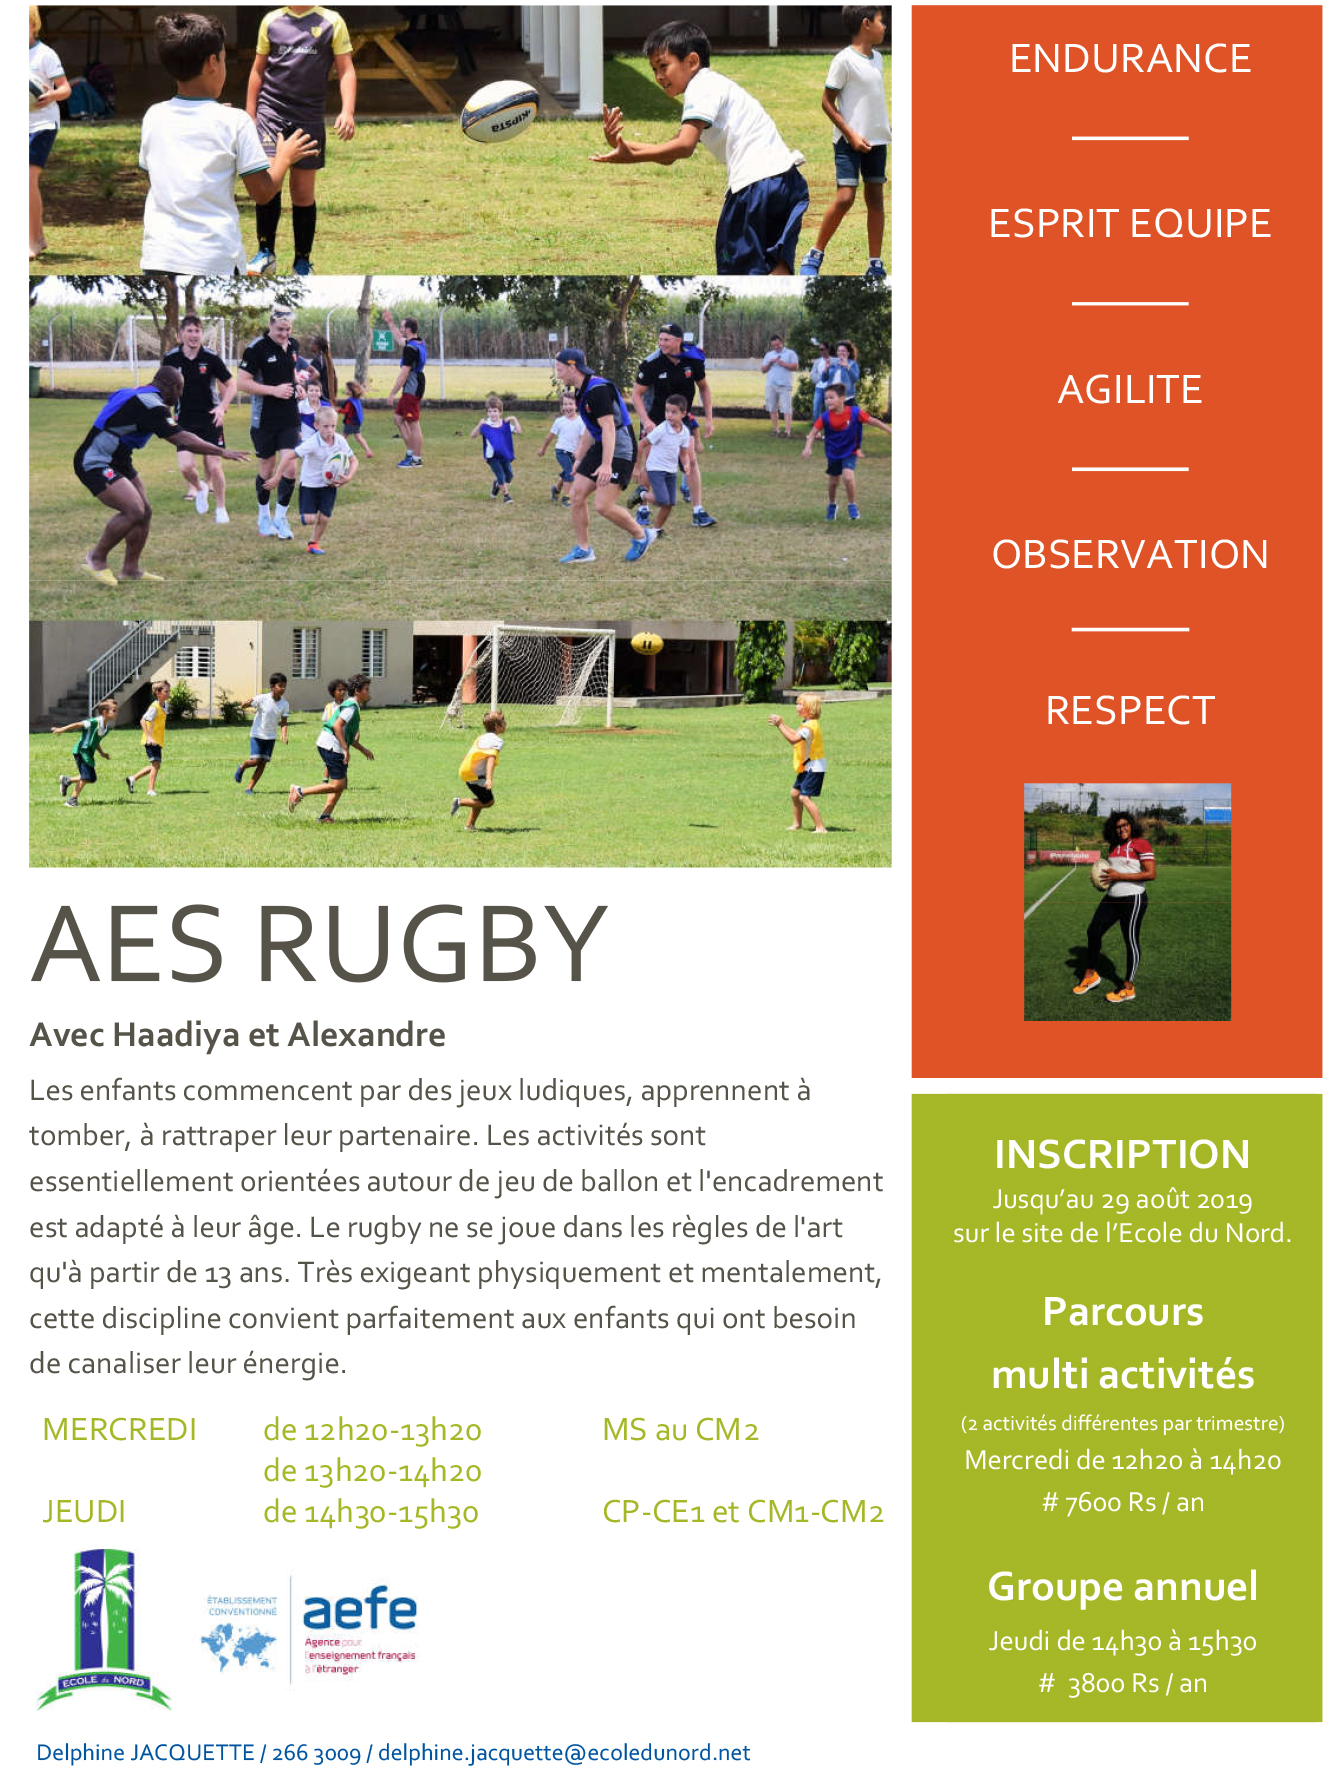 AES 2019-2020 fiches-3 copie